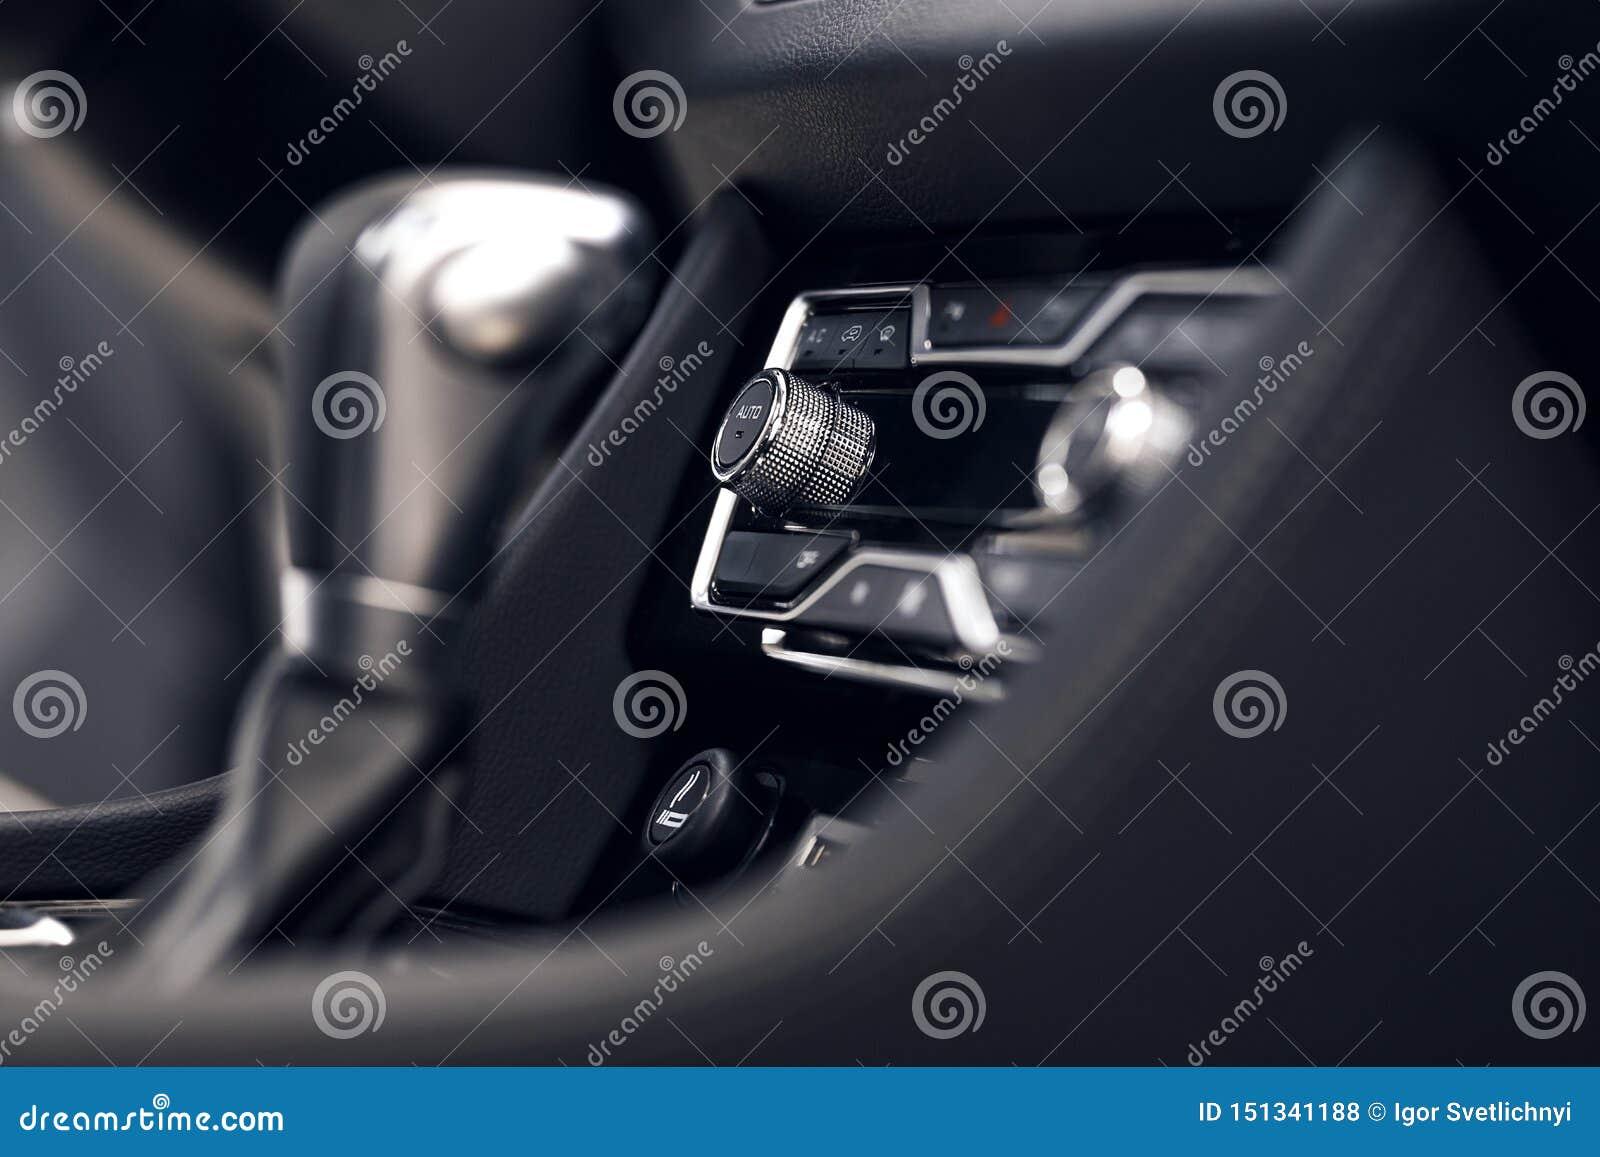 Betingande knapp f?r luft inom en bil Klimatkontrollenhet i den nya bilen moderna bilinredetaljer